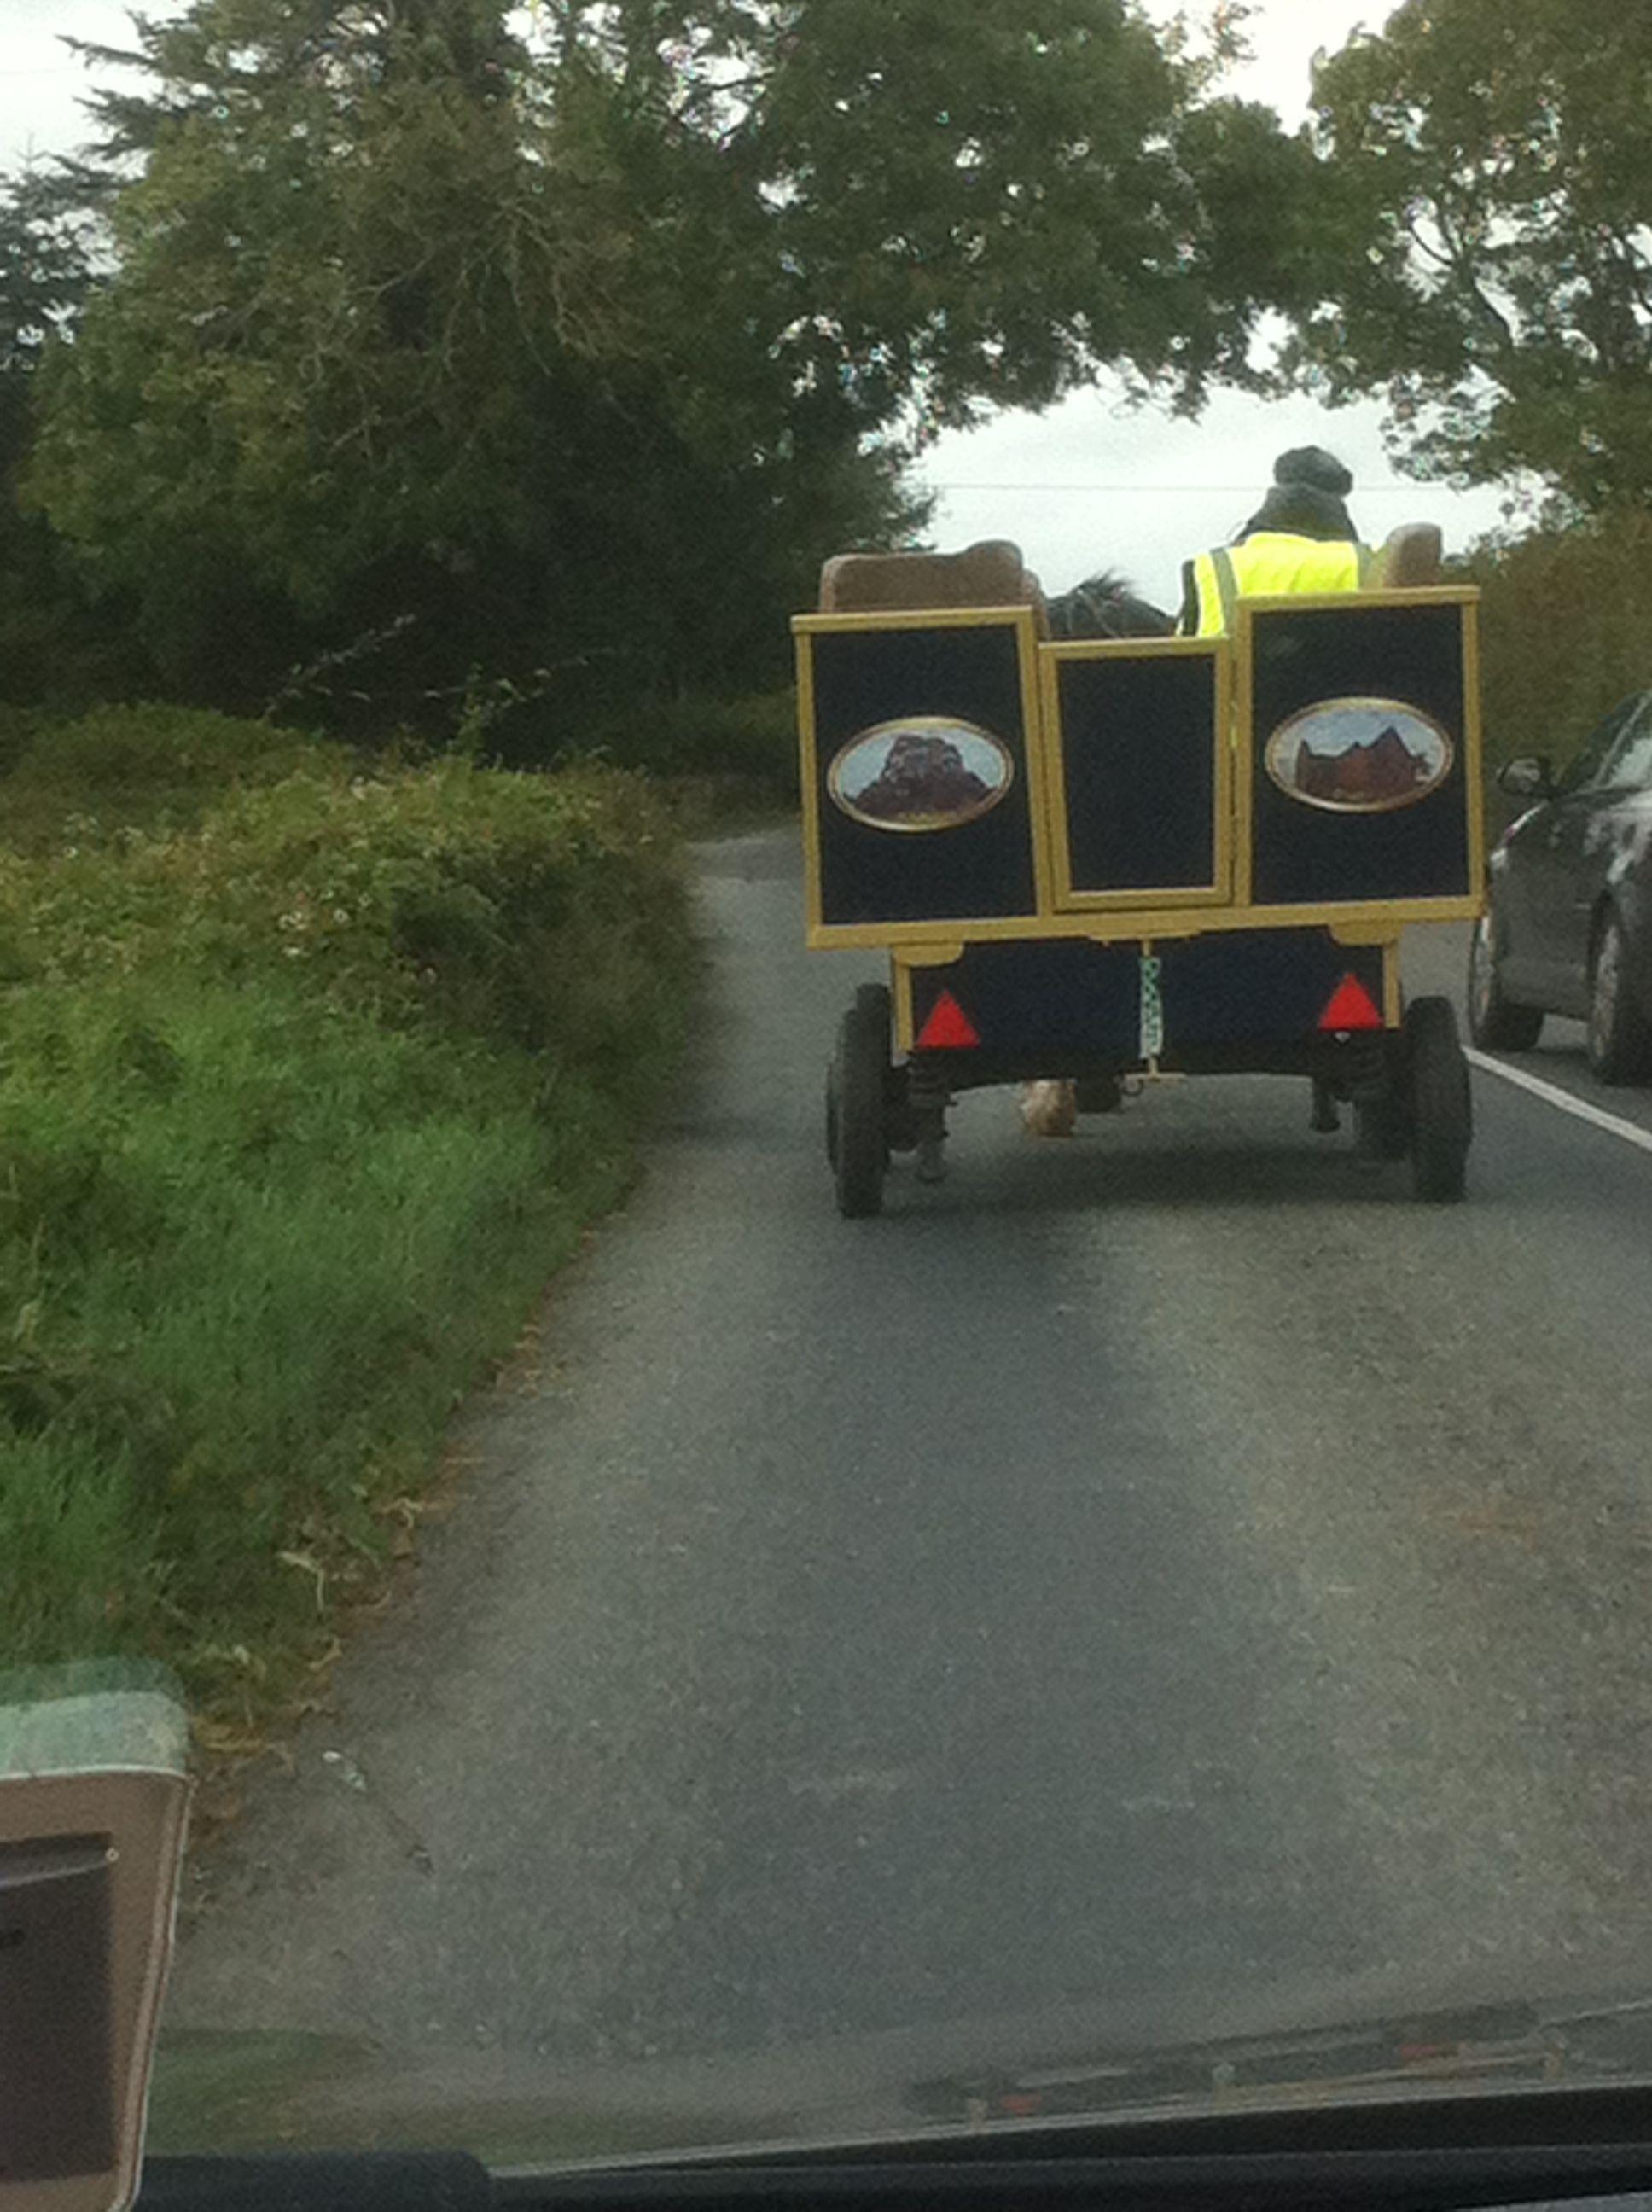 Ireland 10/20/14